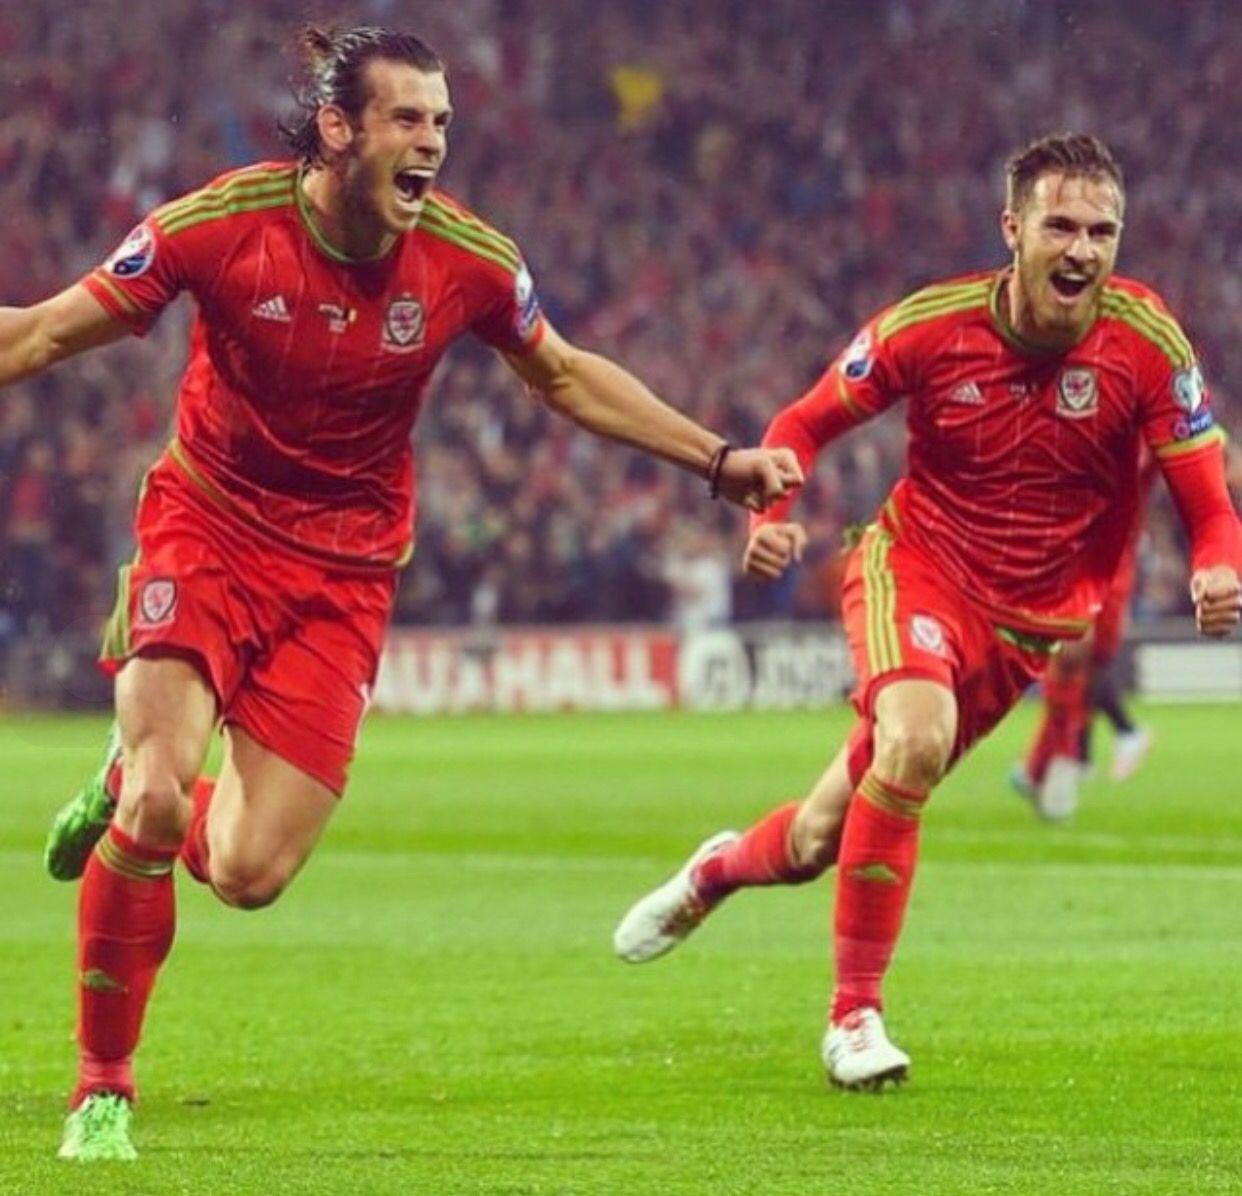 Arsenal Ramsey Bbc sport, Sports, Liverpool football club